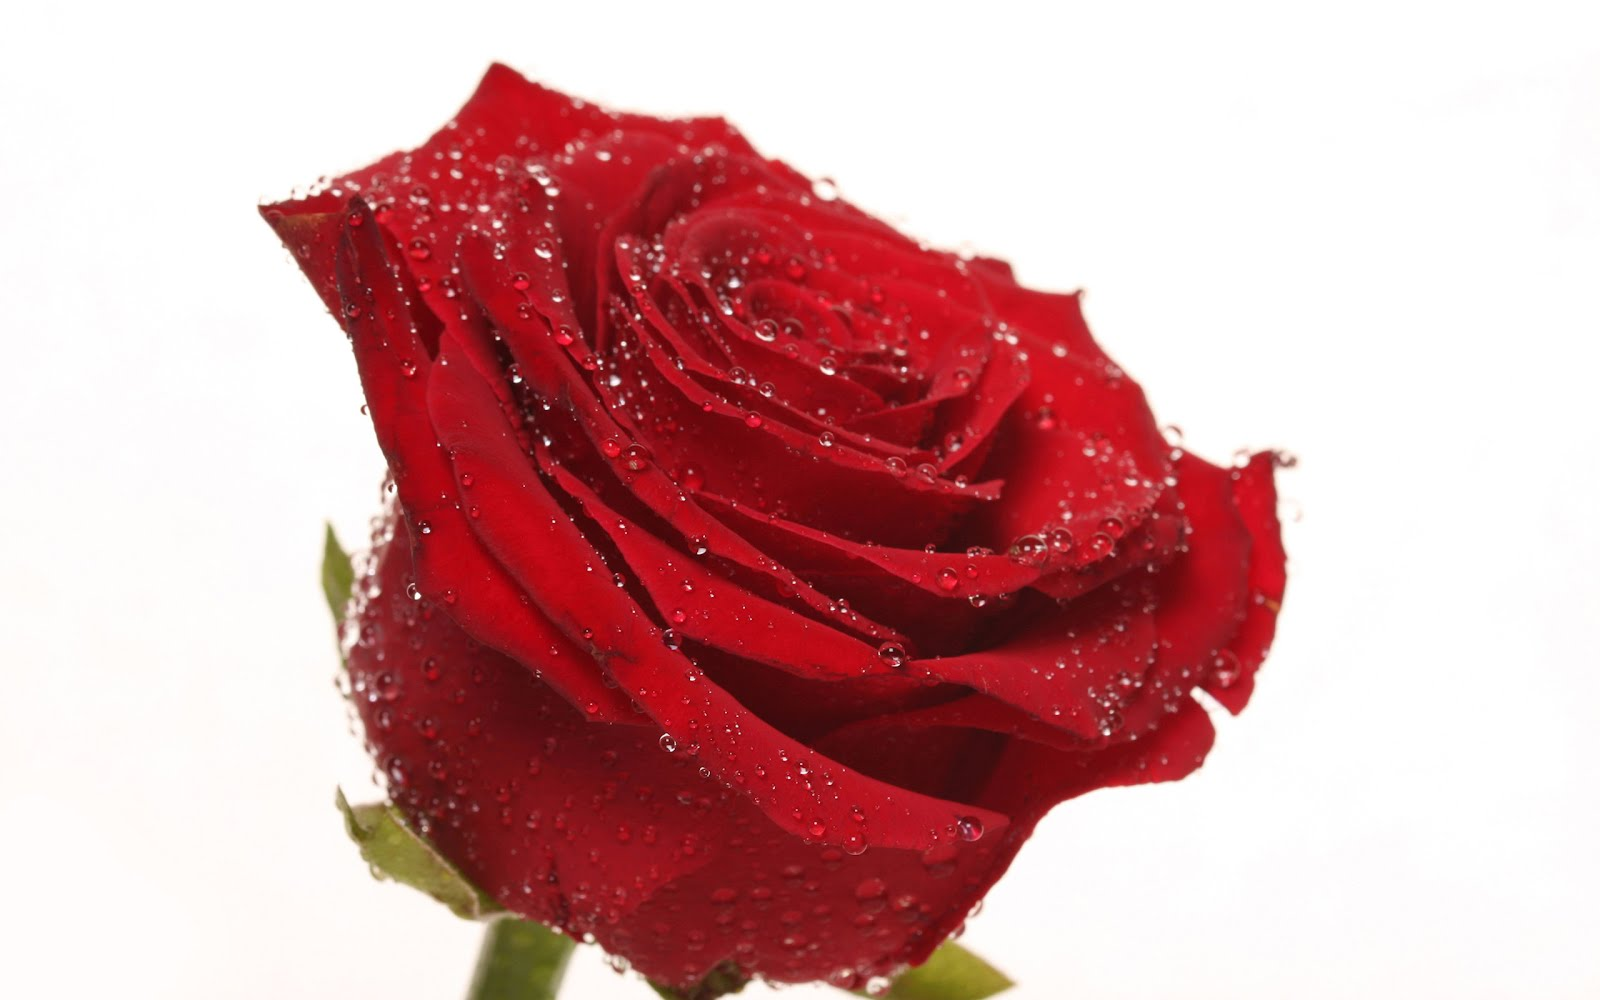 http://2.bp.blogspot.com/-p1_CacSOlu4/UO6_Al-B-yI/AAAAAAAABto/N0NgmEmJ8dA/s1600/red+rose+HD+wallpaper+(14).jpg